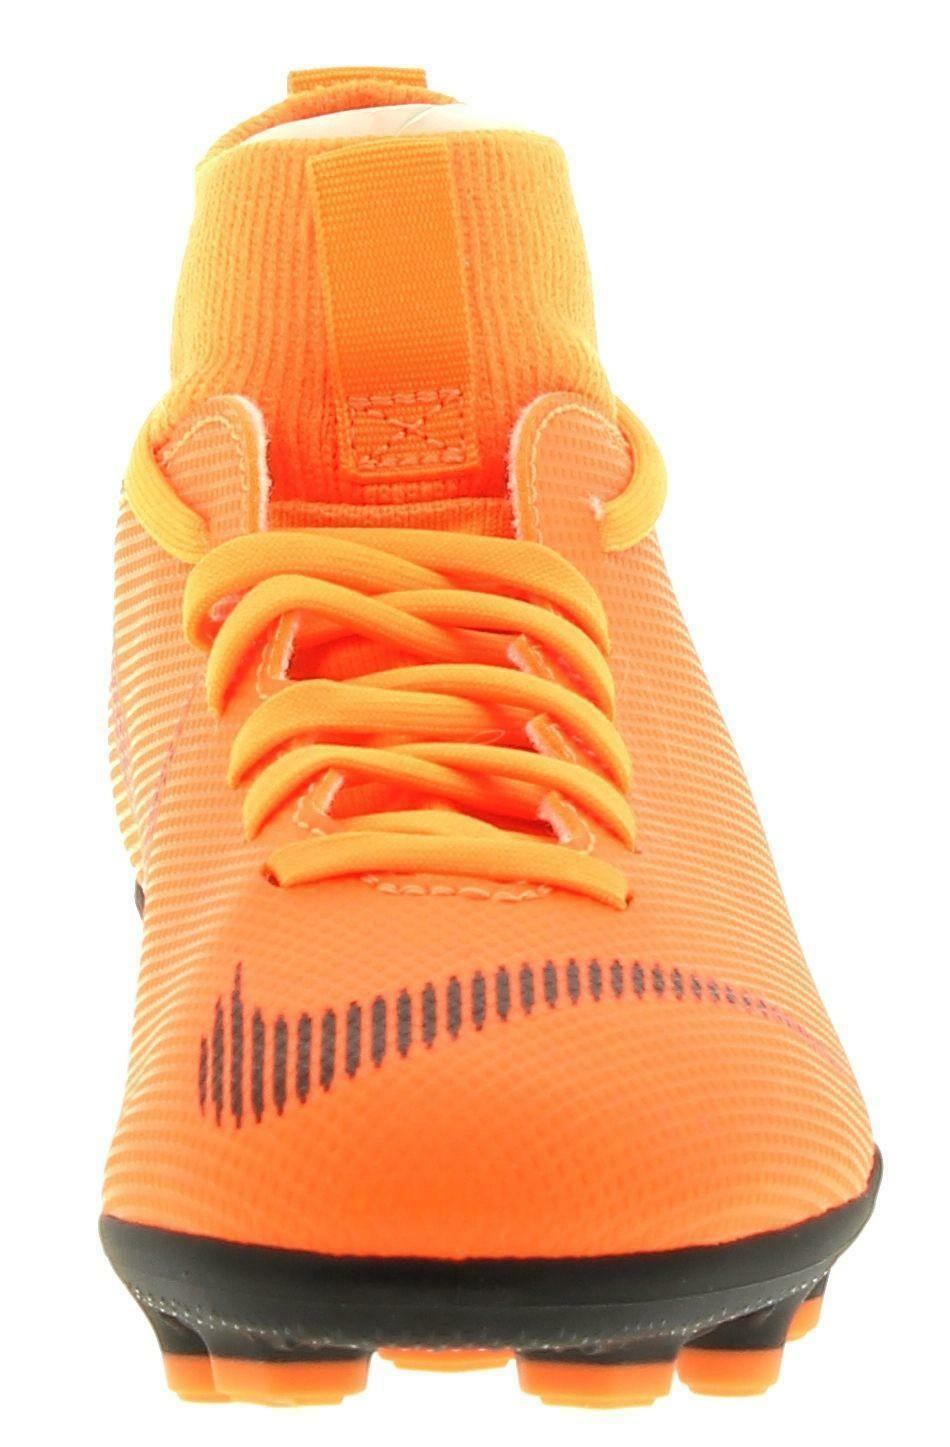 Club 6 Scarpe Calcio Nike Superfly Arancioni Mg orCxeBd